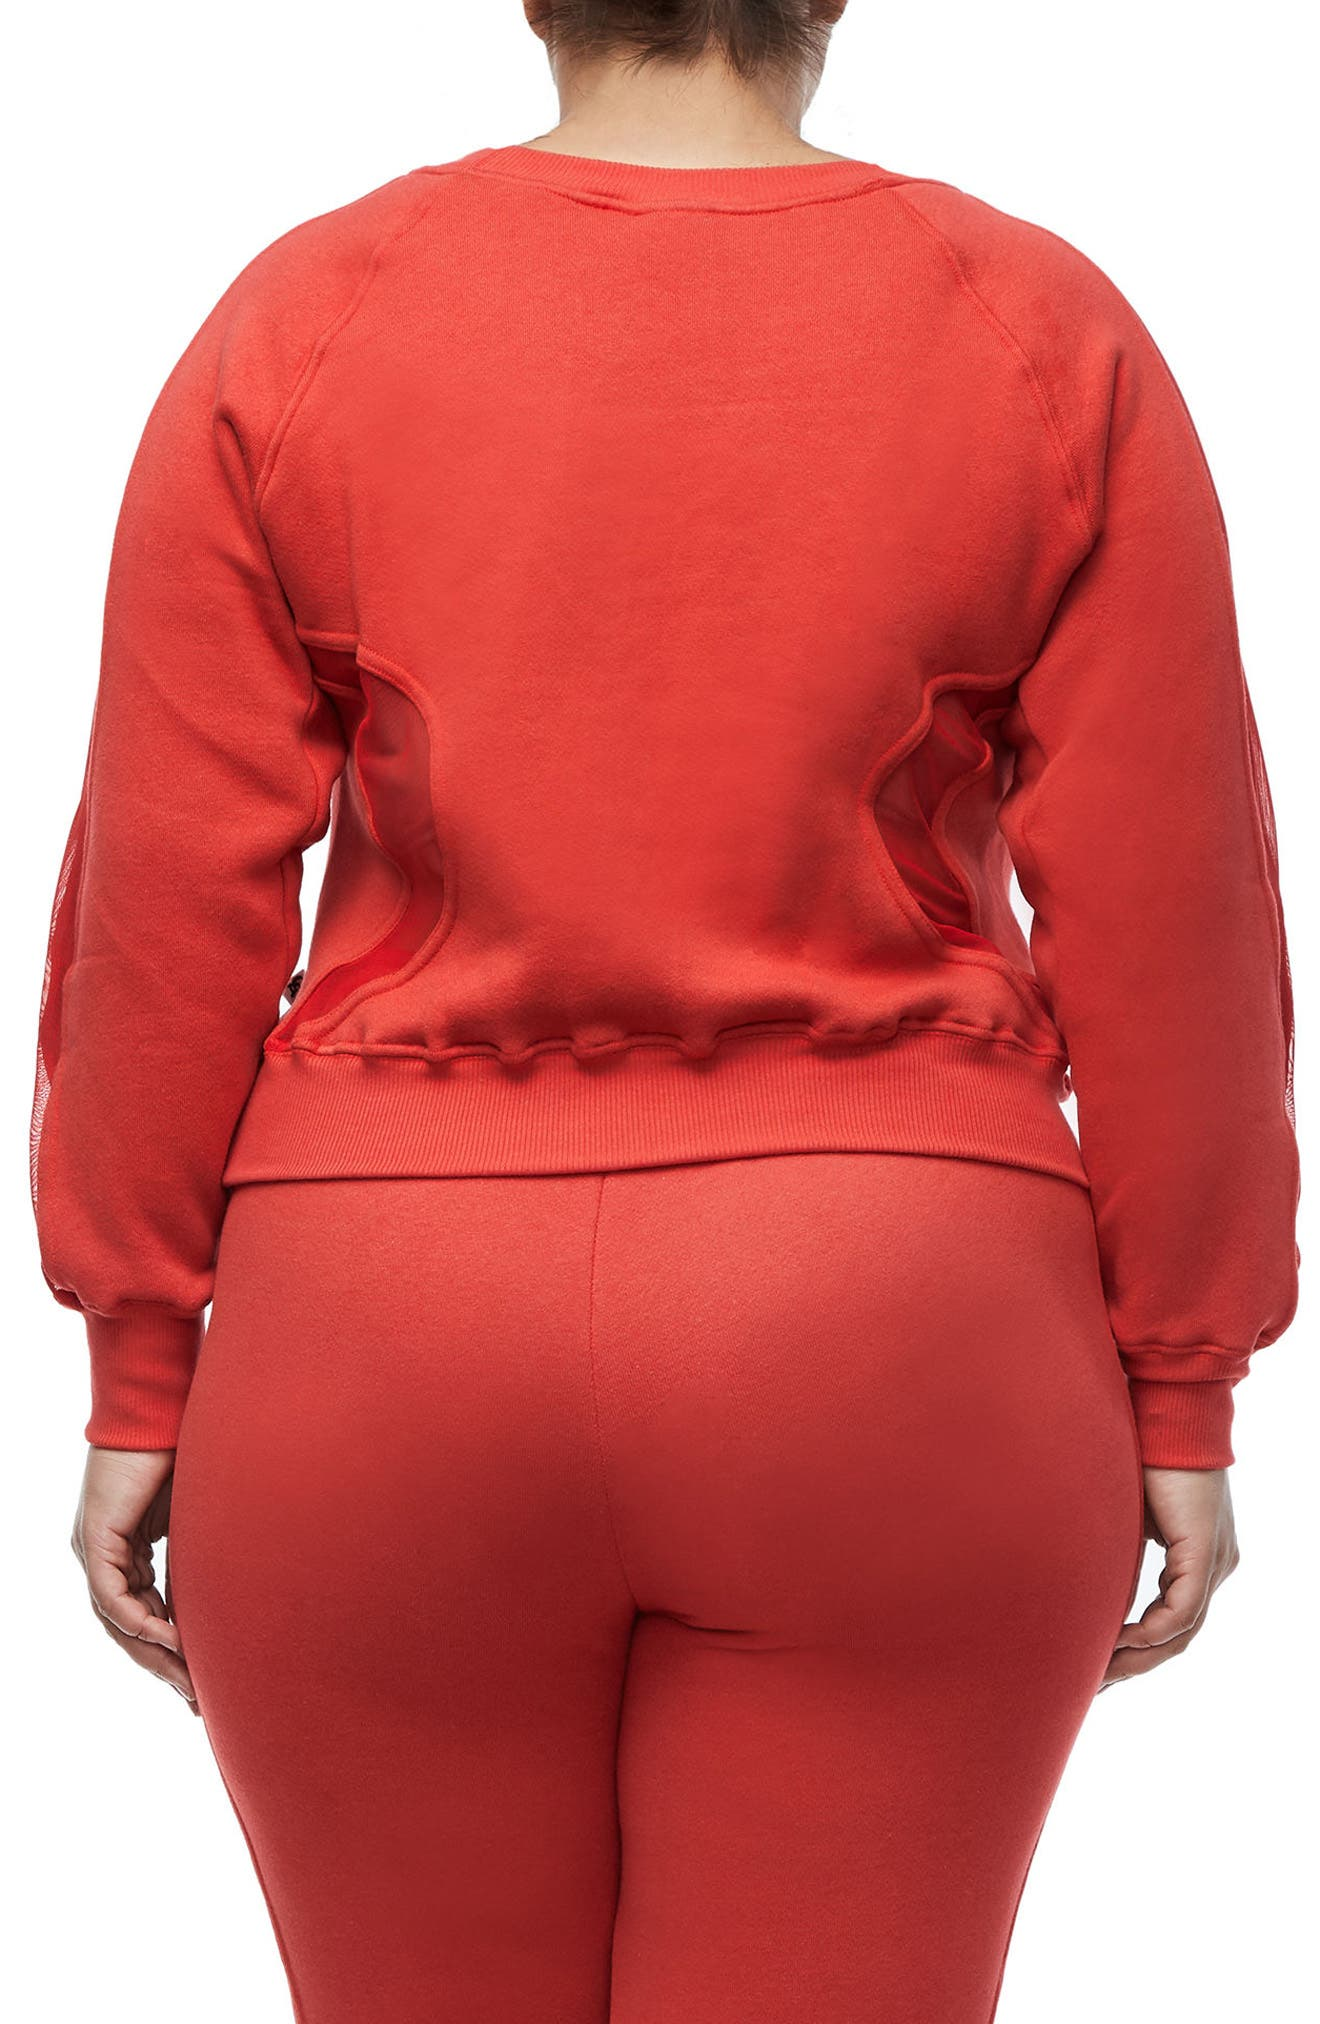 Good Sweats Mesh Inset Sweatshirt,                             Alternate thumbnail 4, color,